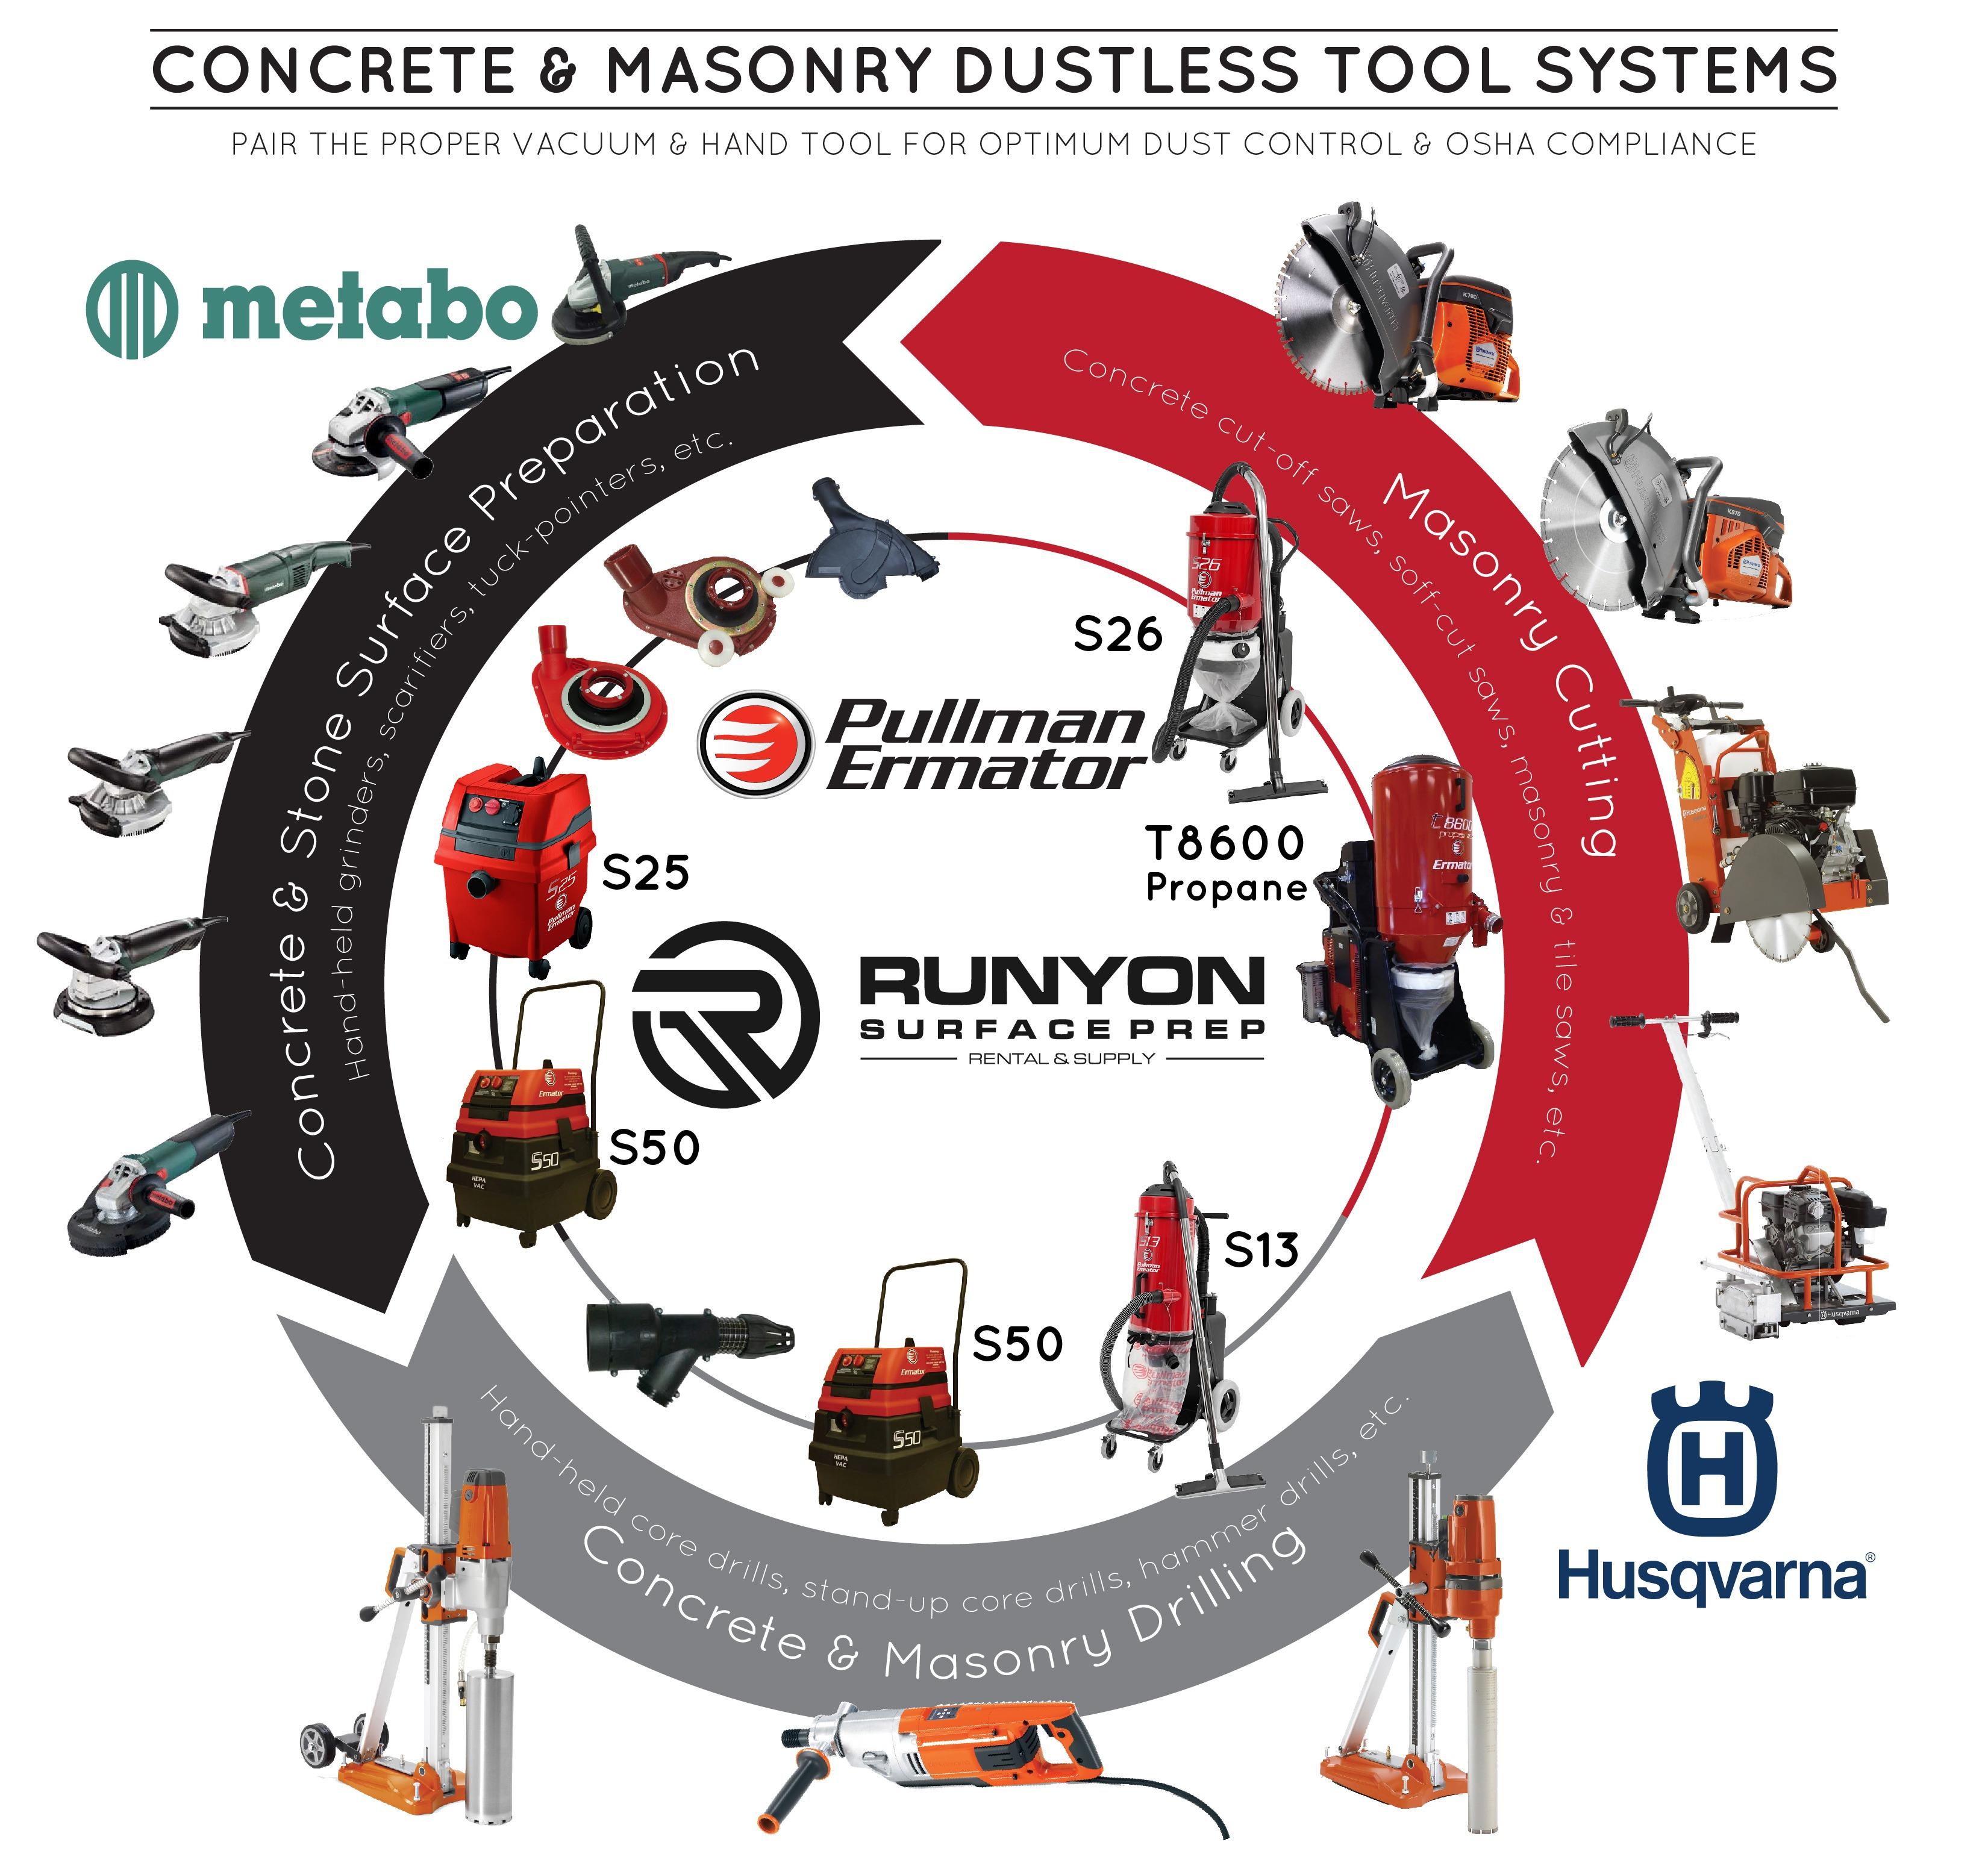 Concrete & Masonry Dustless Tool Systems